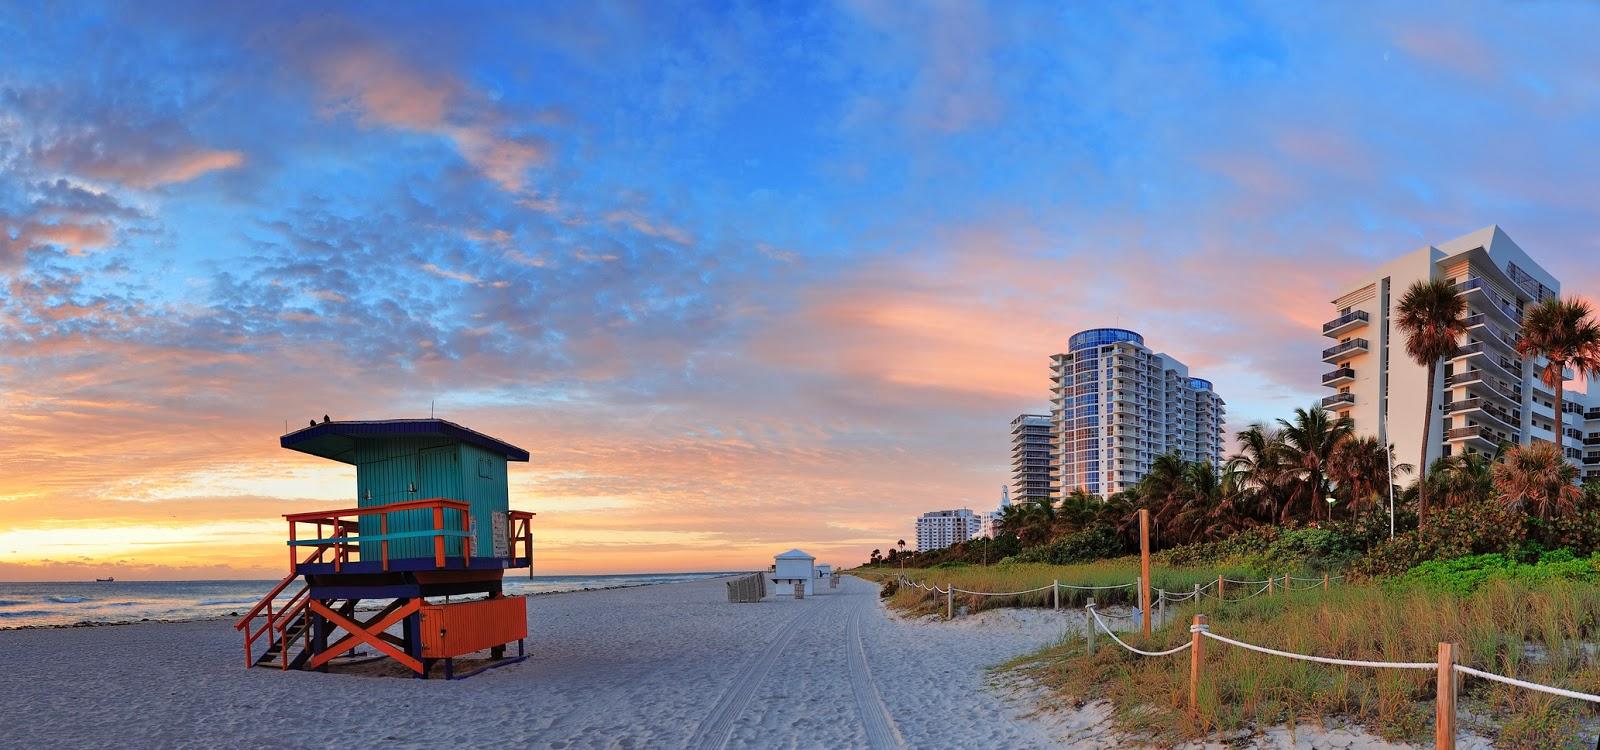 "<img src=""http://1.bp.blogspot.com/-K5Uw33mWUDI/VDP8B3GRg4I/AAAAAAAAA8U/LGCMQPwX0OU/s1600/south.jpeg"" alt=""Top 10 Best Beaches in the World that are Very Beautiful"" />"